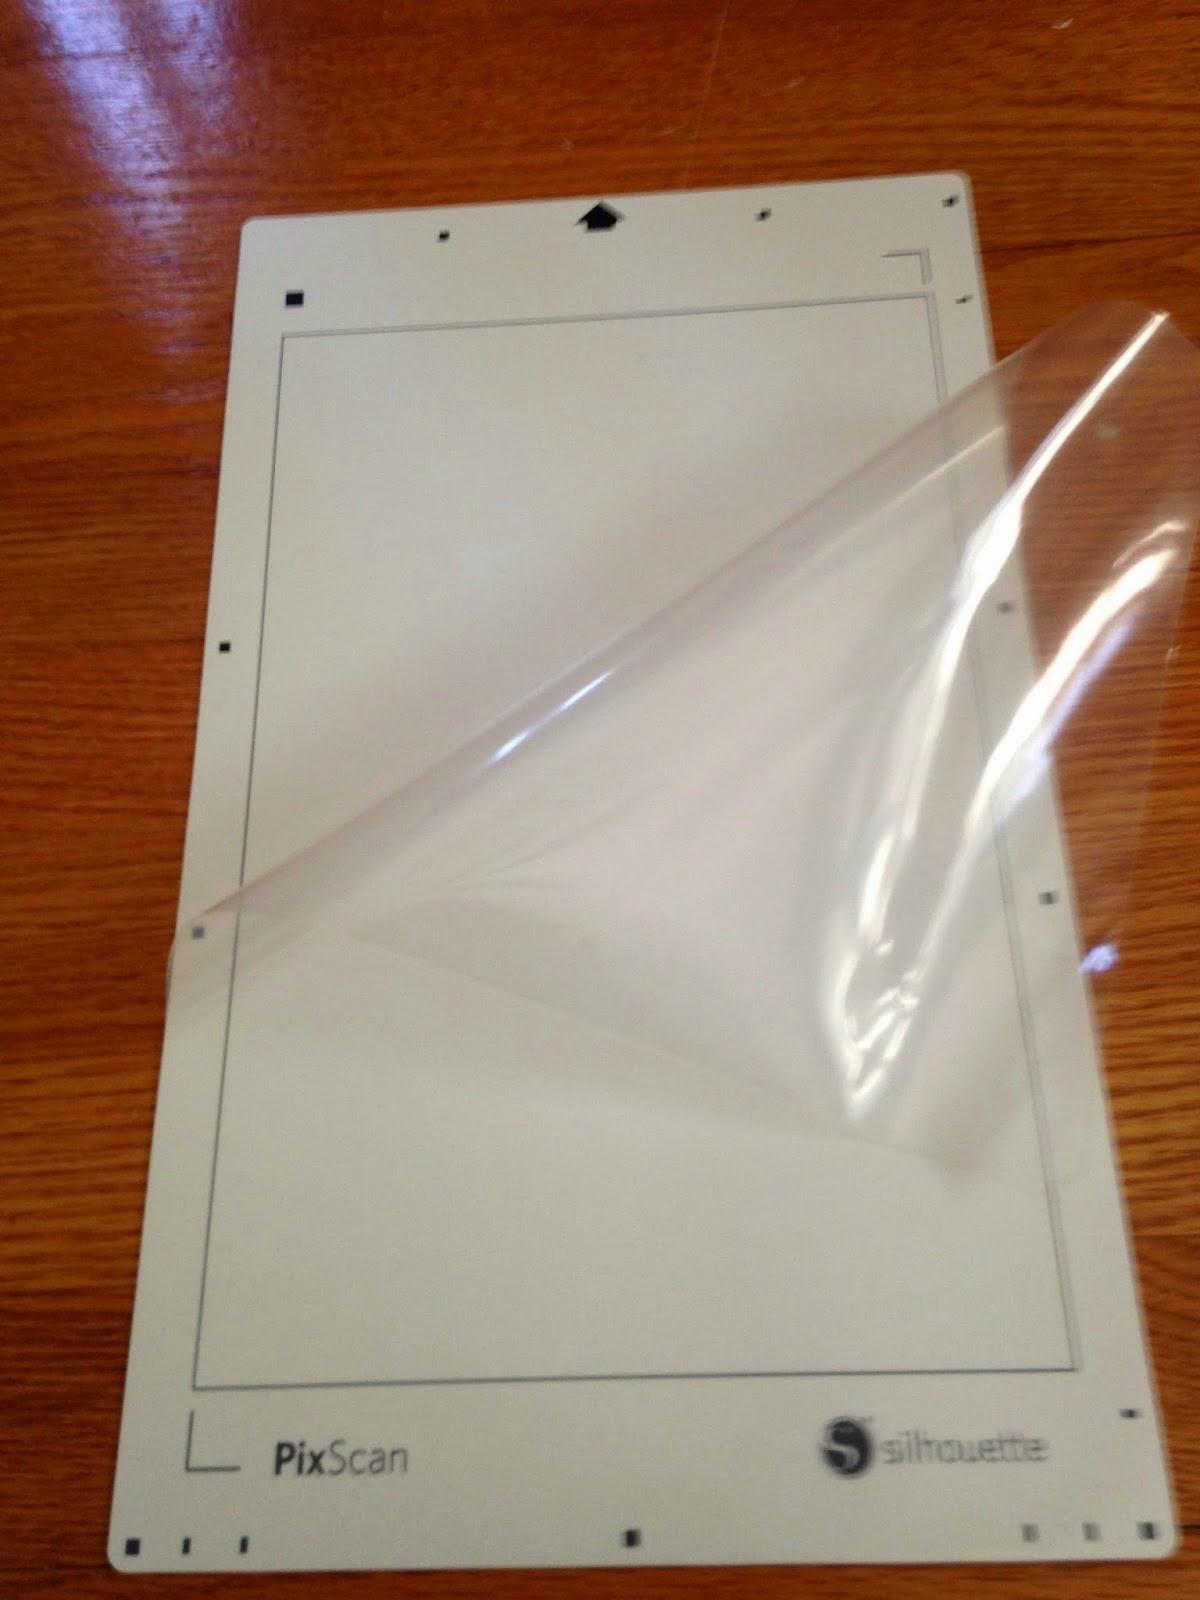 Silhouette Pixscan, beginner, tutorial, Silhouette Studio, protective sheet